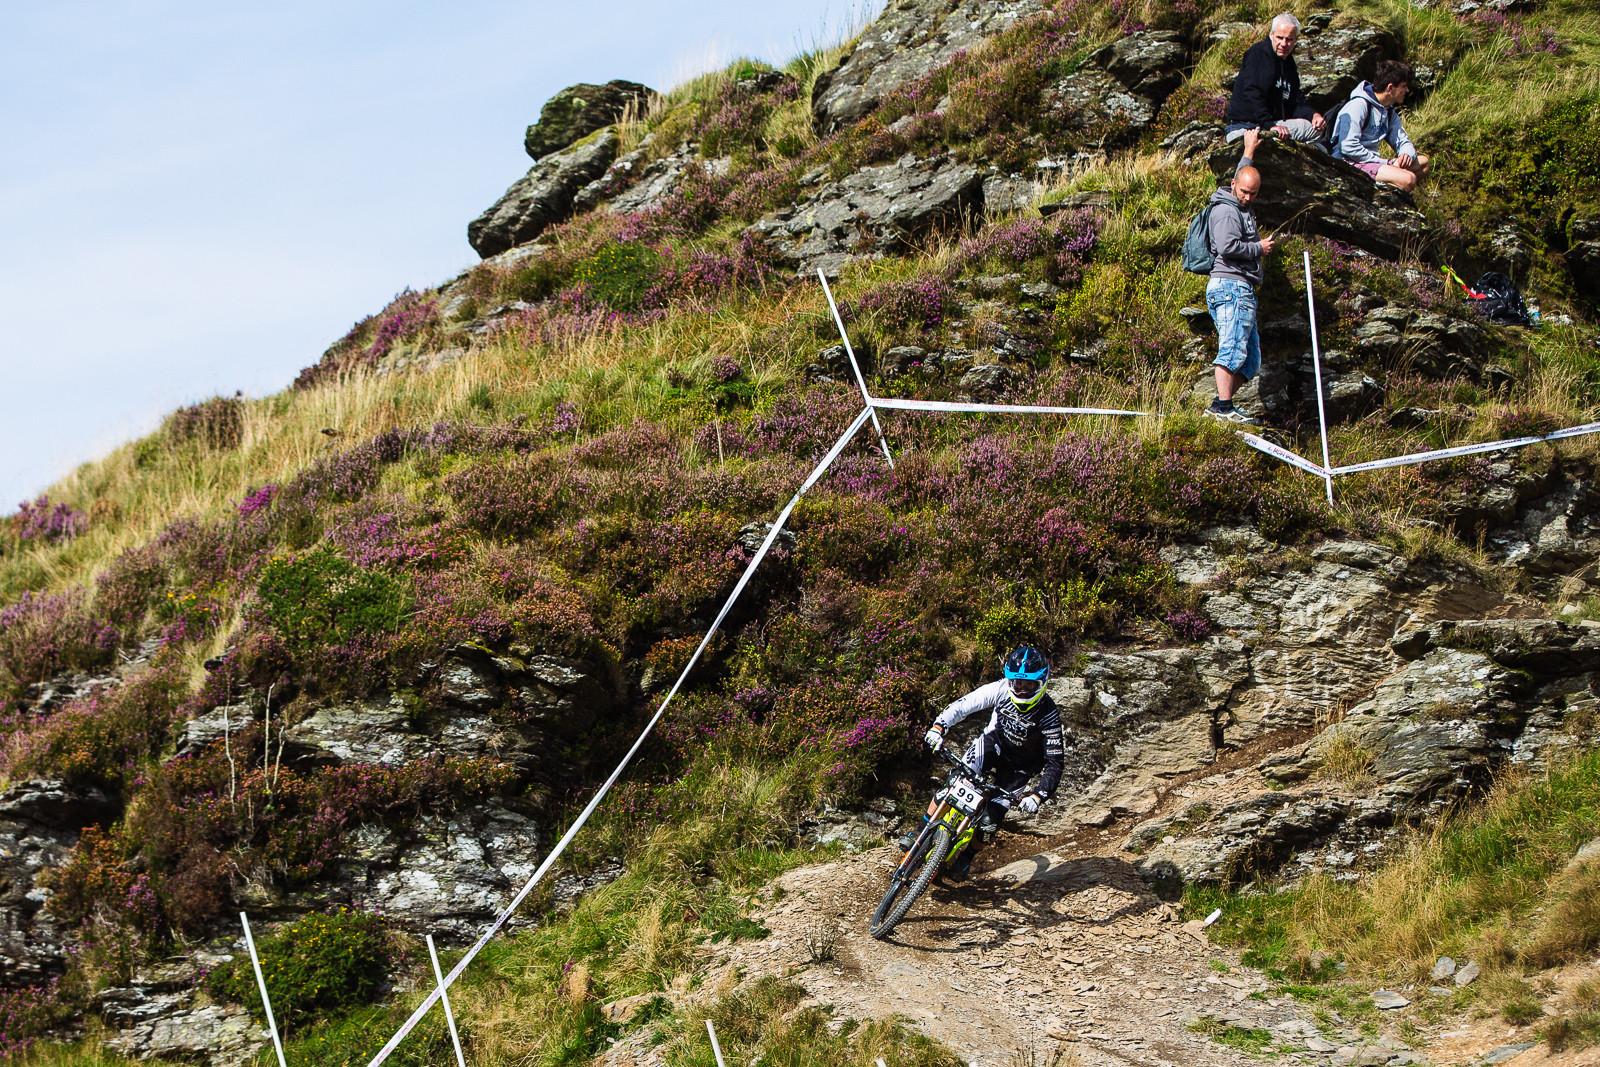 NEVER CLIP IN - 2015 British Downhill Series Finals, Antur Stiniog - 2015 British Downhill Series Finals - Mountain Biking Pictures - Vital MTB